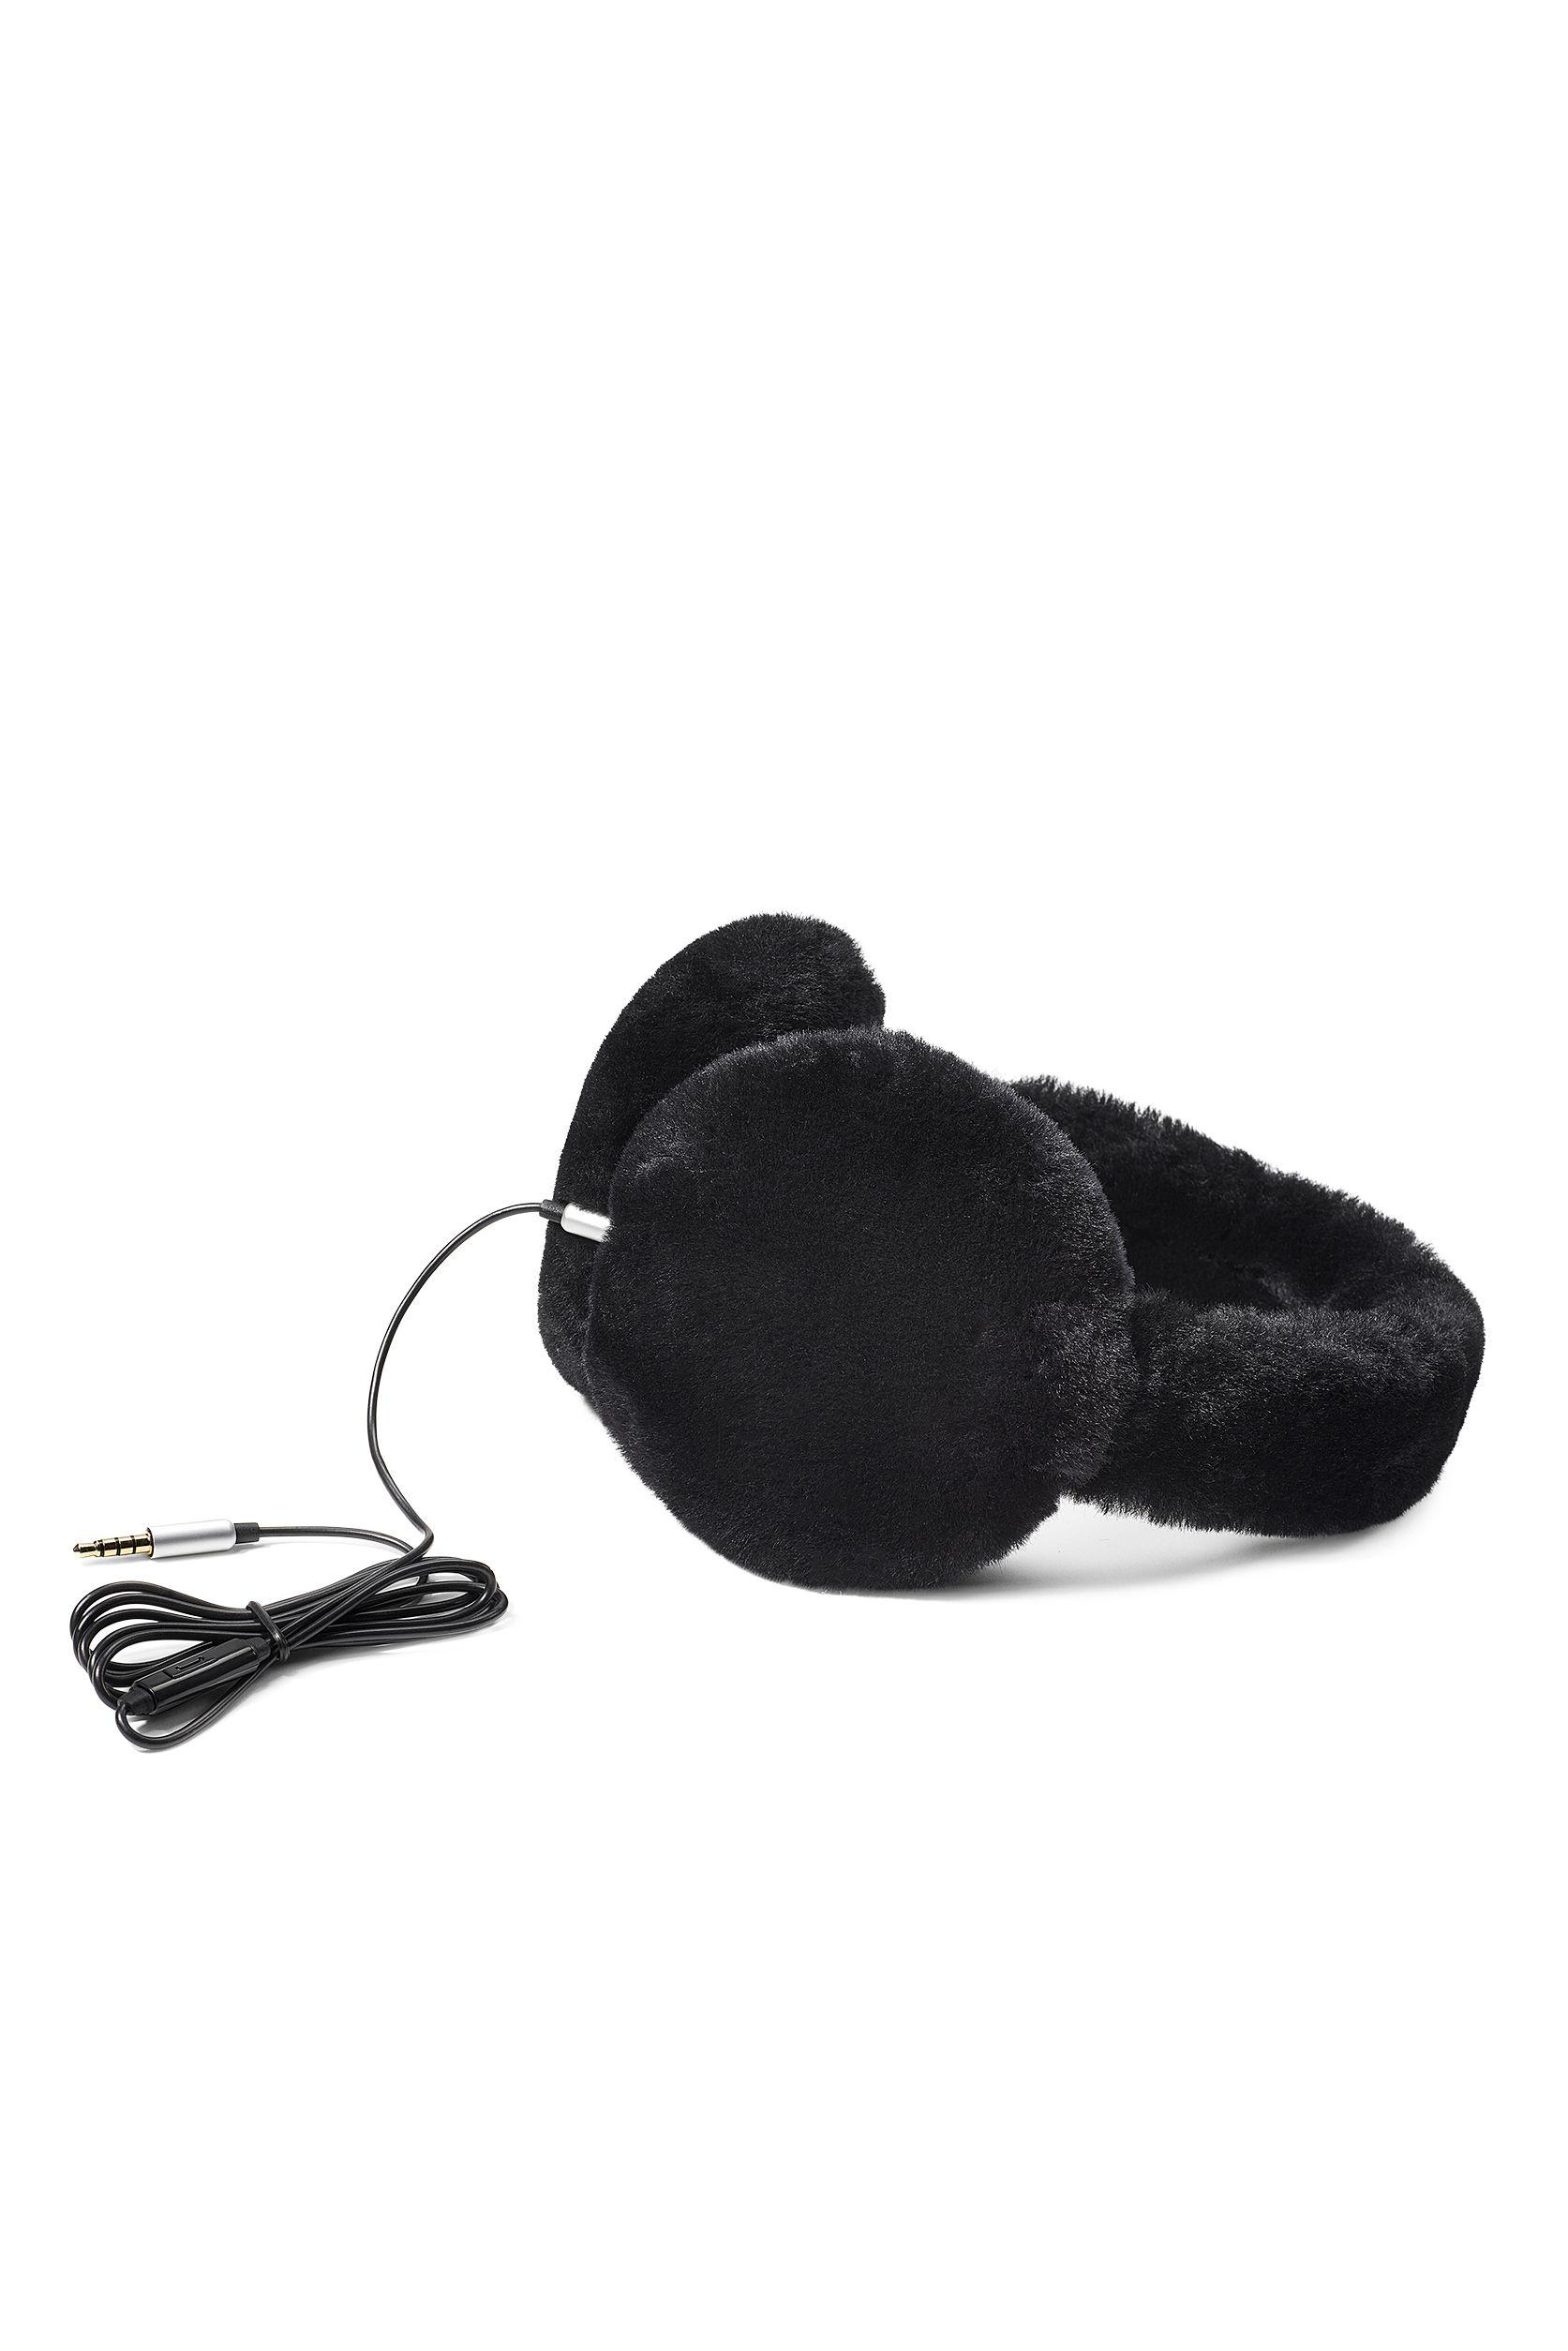 Sheepskin Headphone Earmuffs